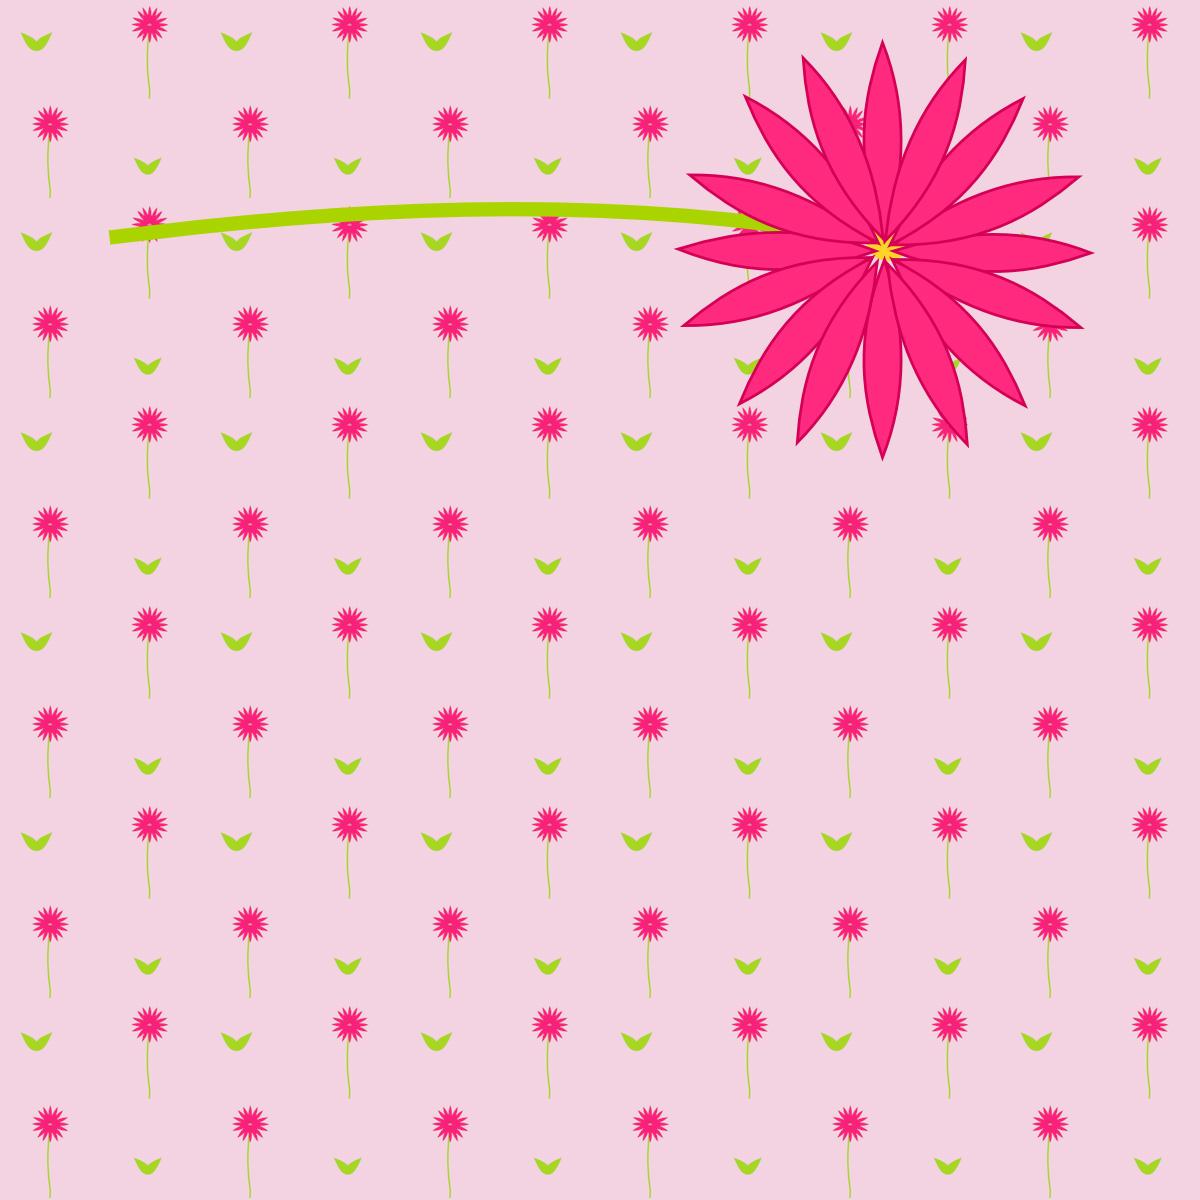 free scrapbook flower clipart - photo #12